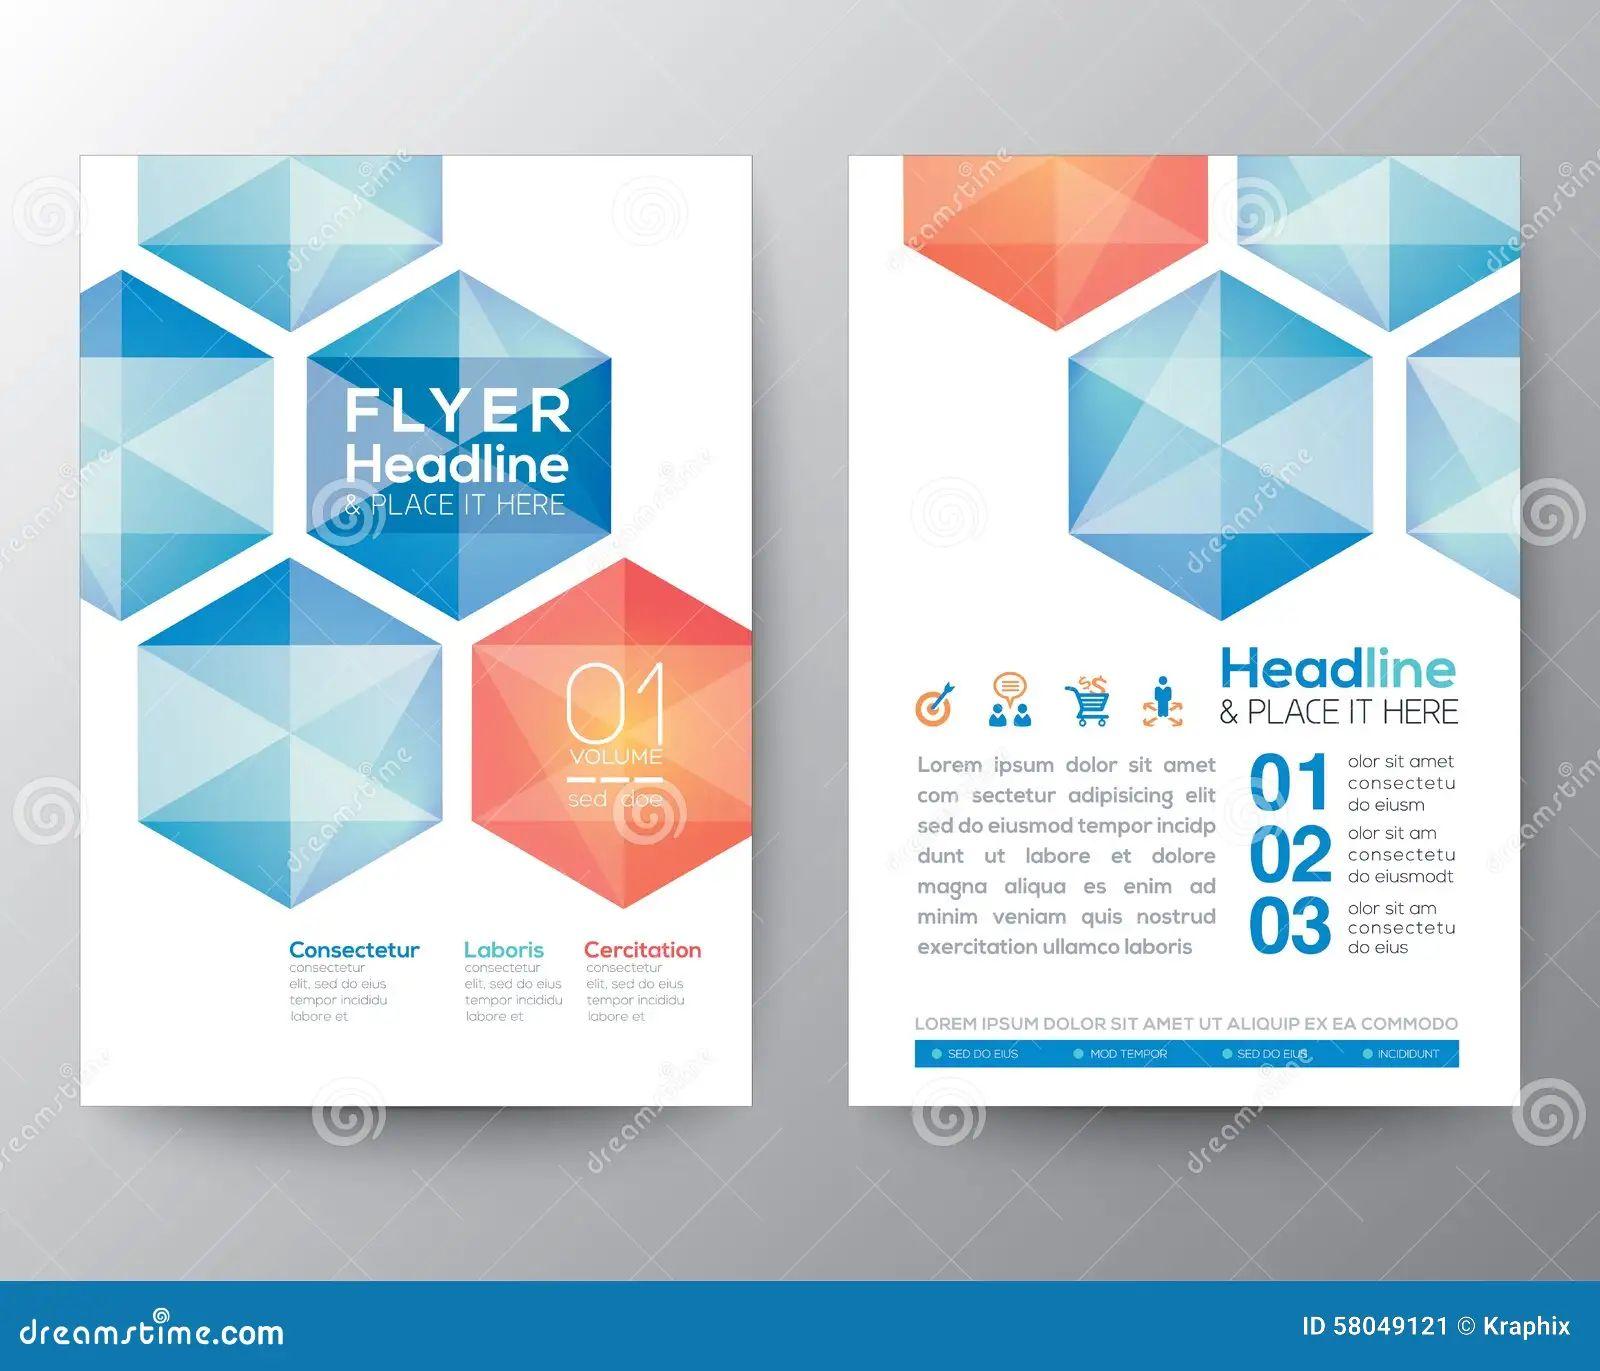 Poster design template -  Poster Brochure Flyer Design Template Layout Download